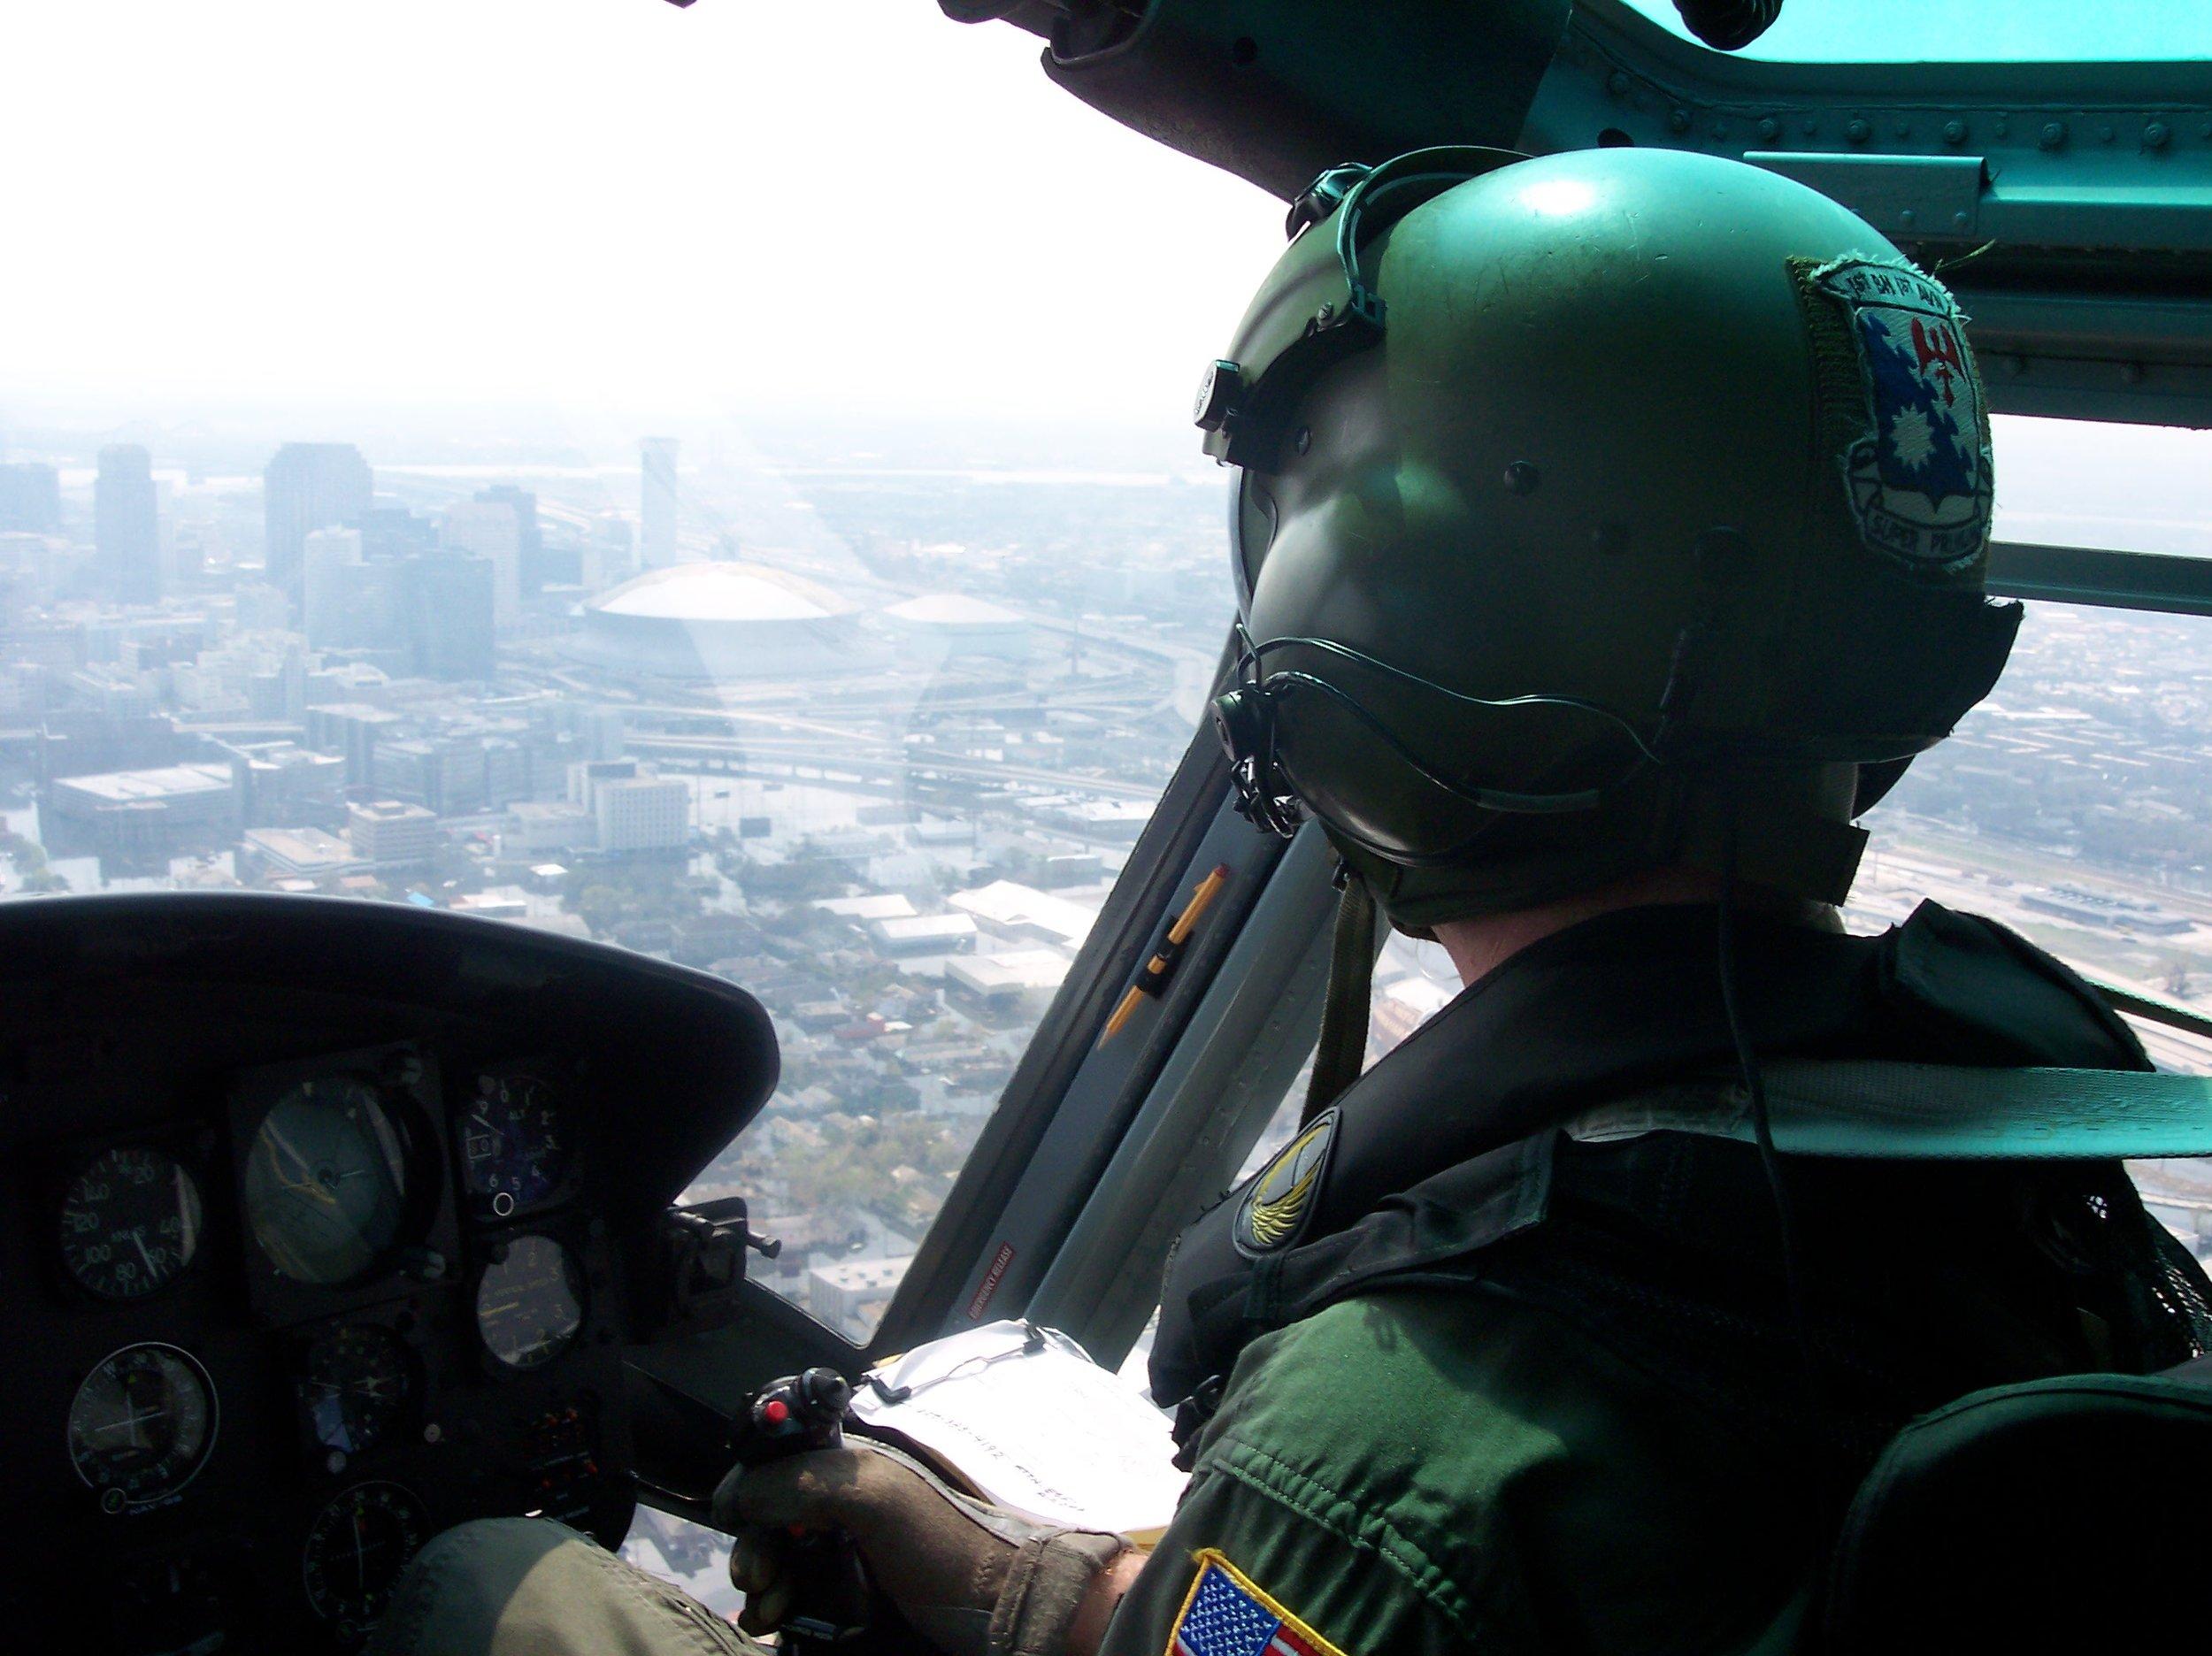 Hurricane Katrina rescue mission